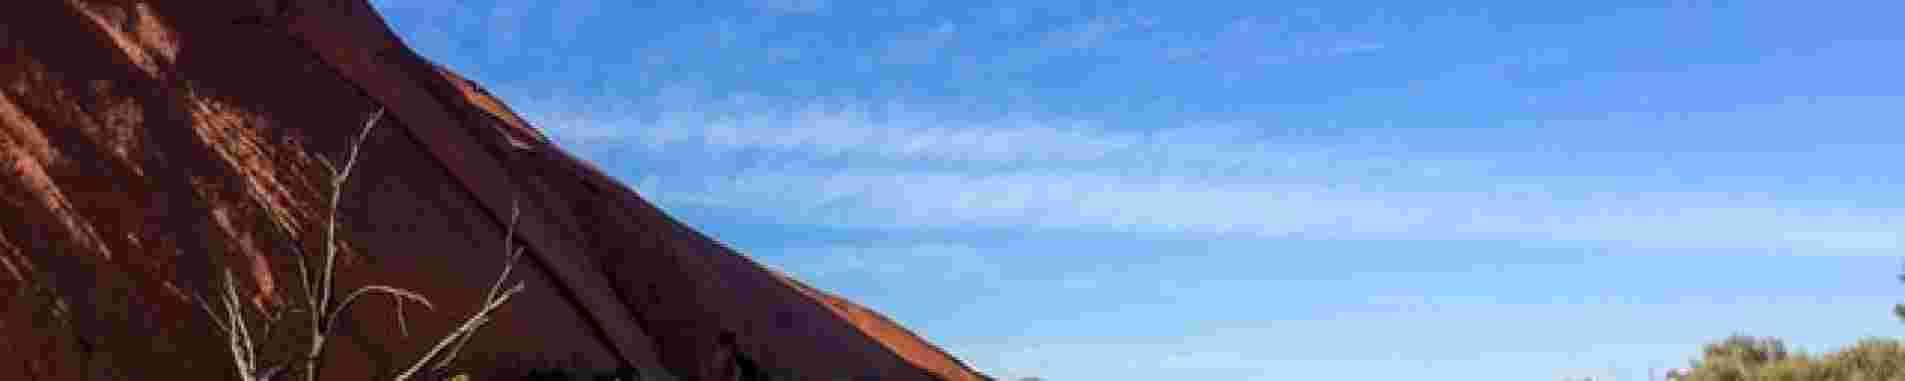 Northern Territory header image